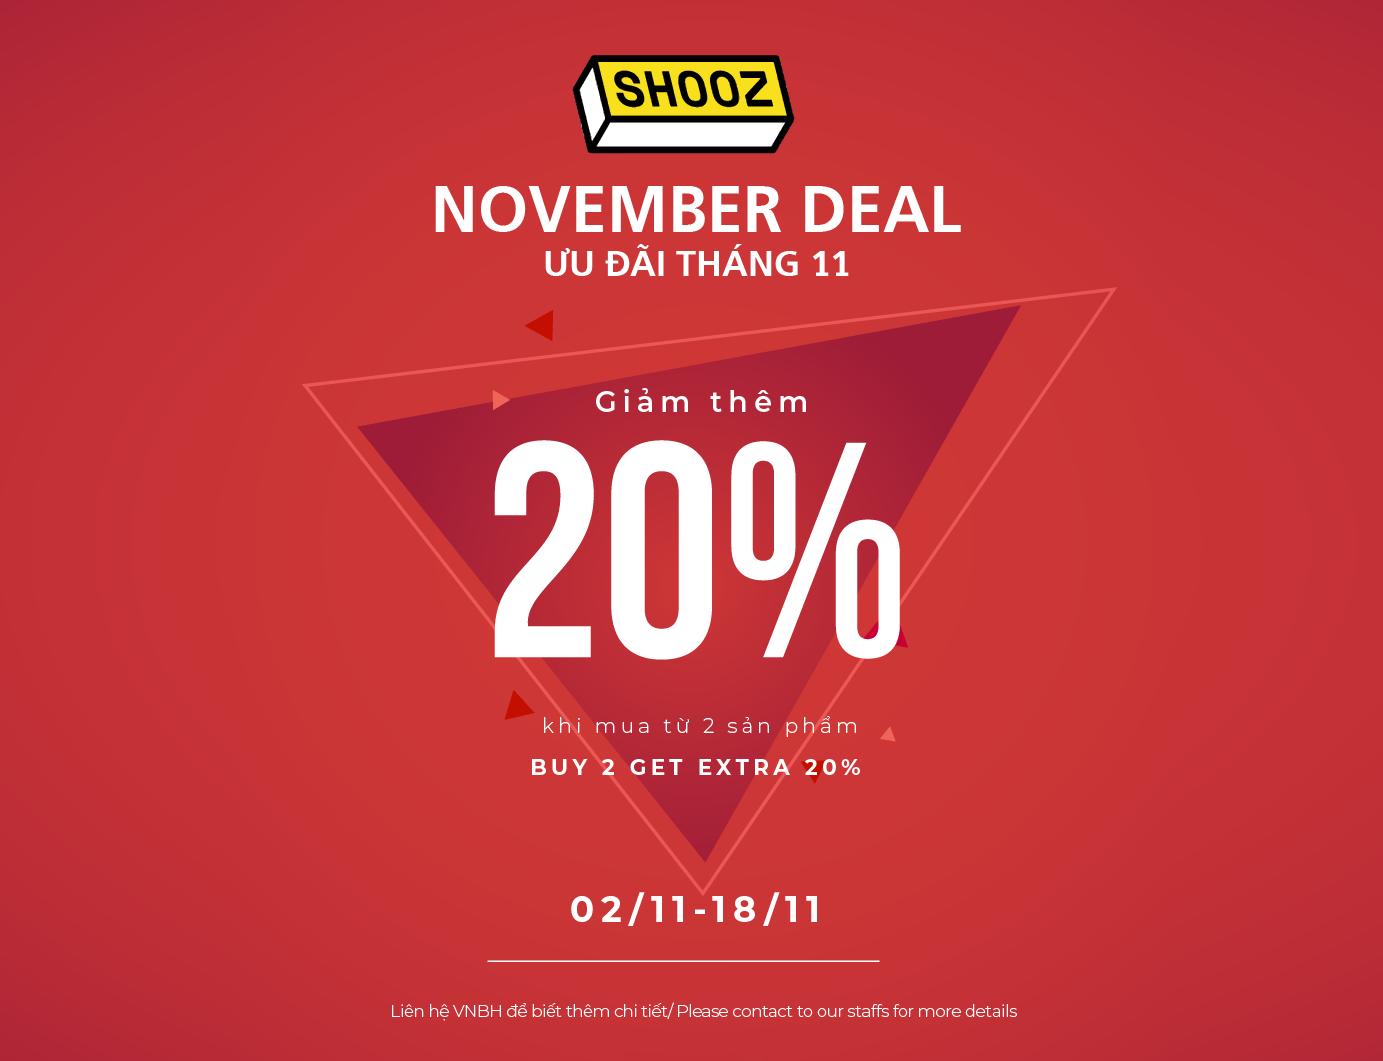 SHOOZ – HOT NOVEMBER DEAL!!!